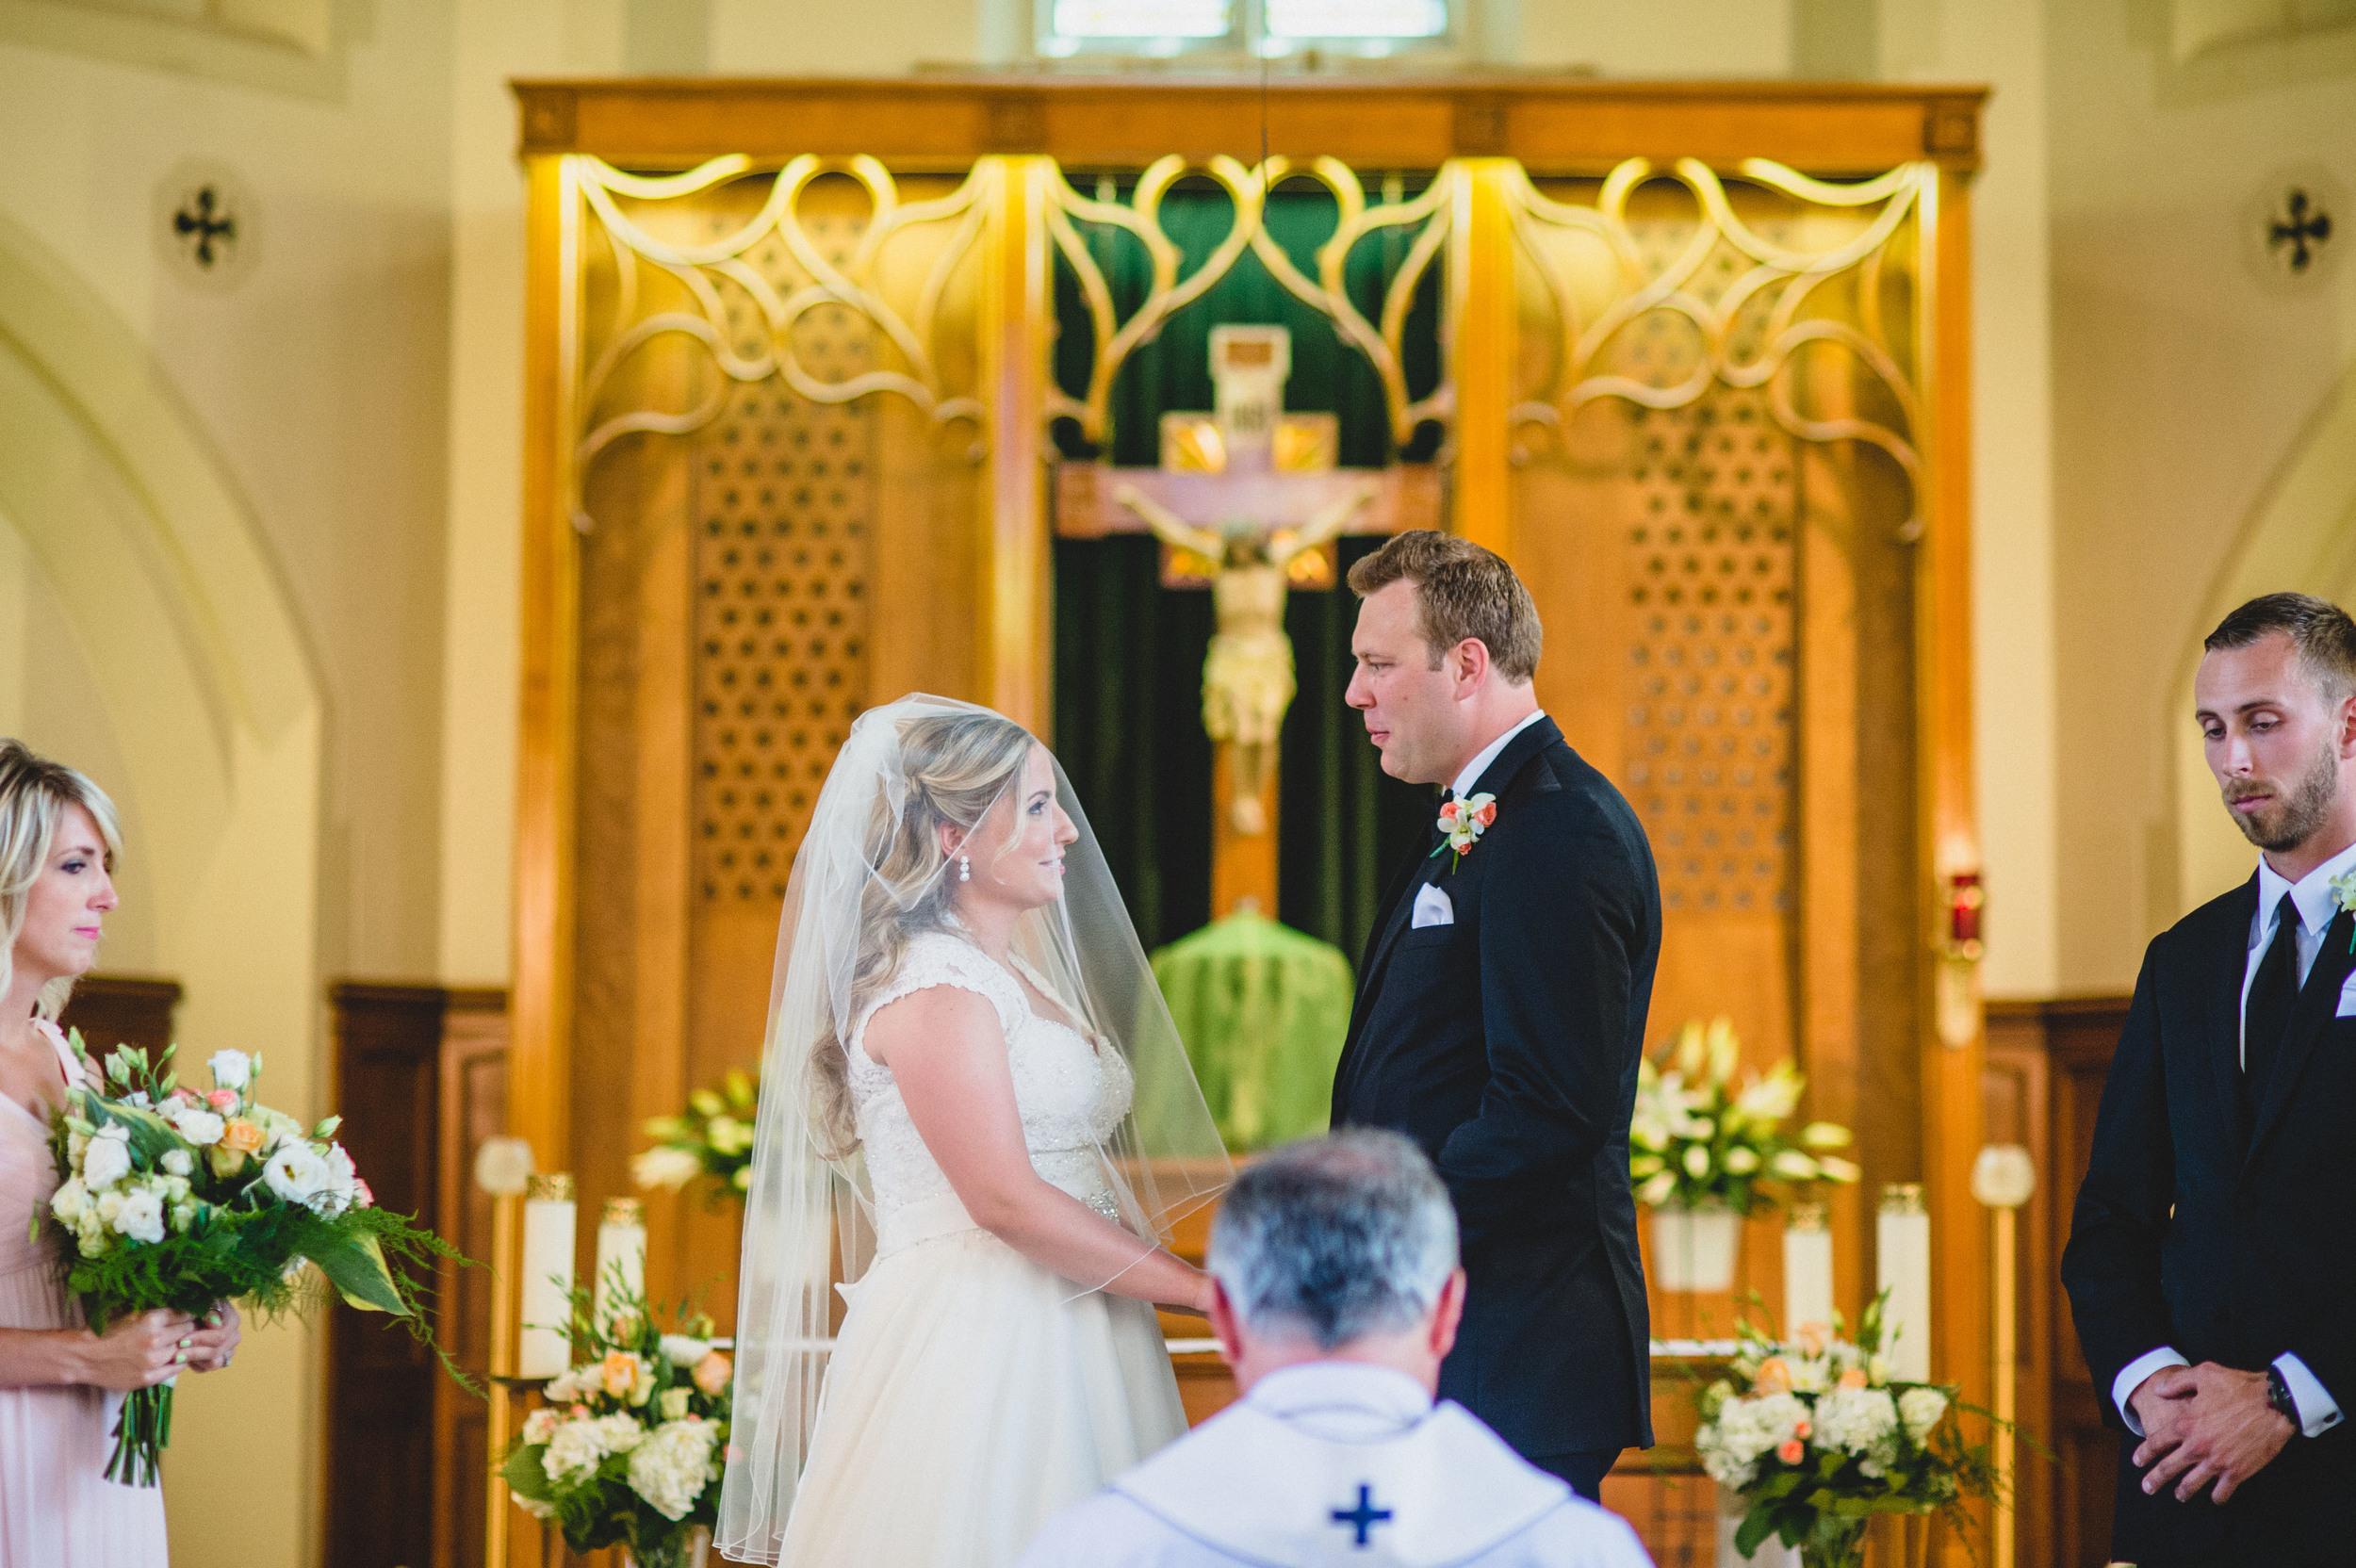 Vancouver St Augustine 's Church wedding photographer edward lai photography-42.jpg